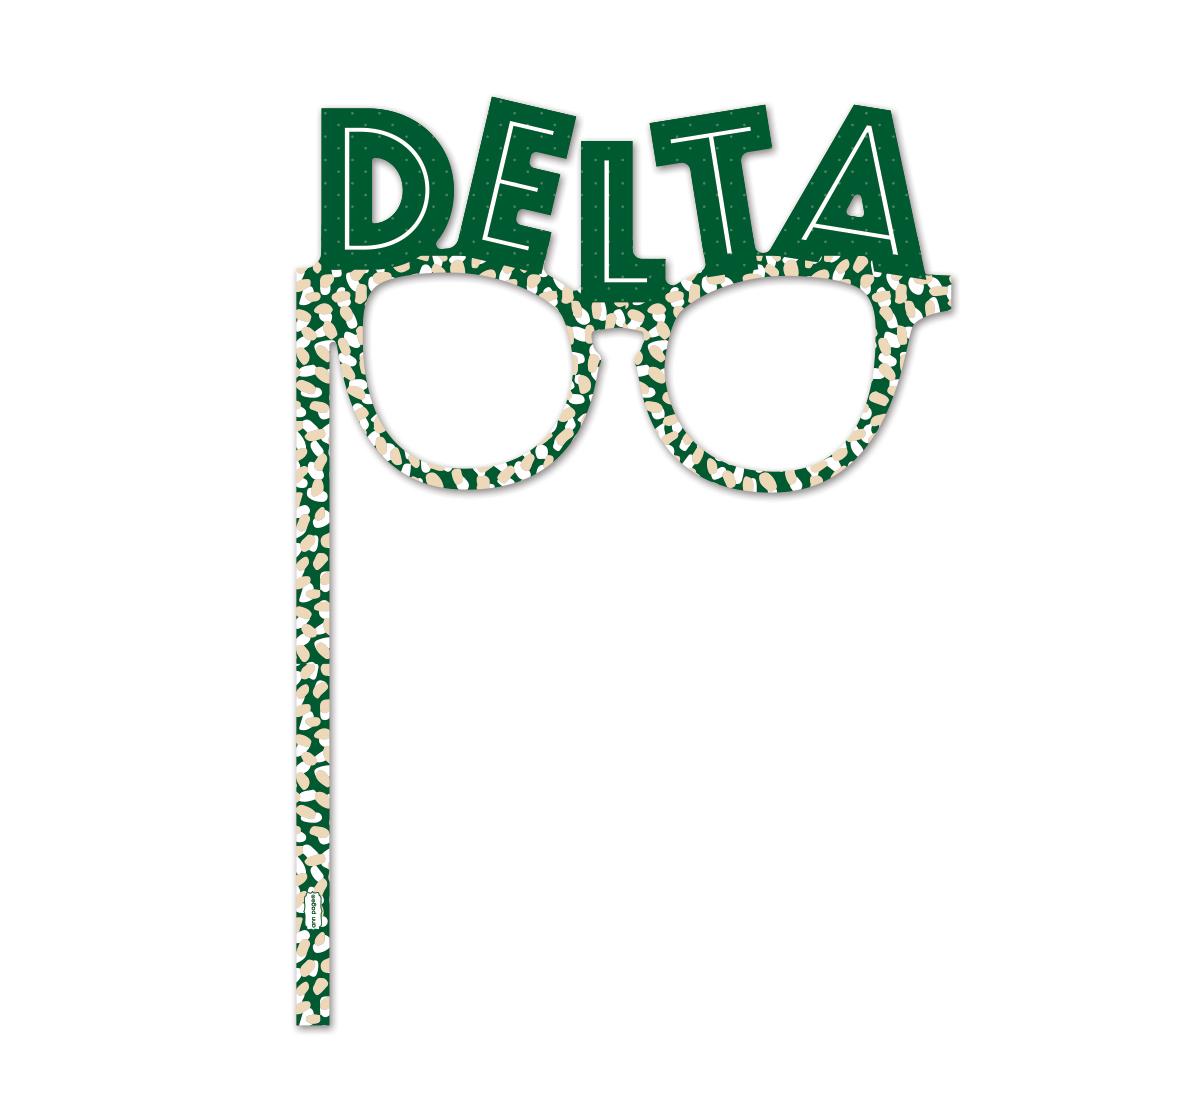 Delta Photo Prop